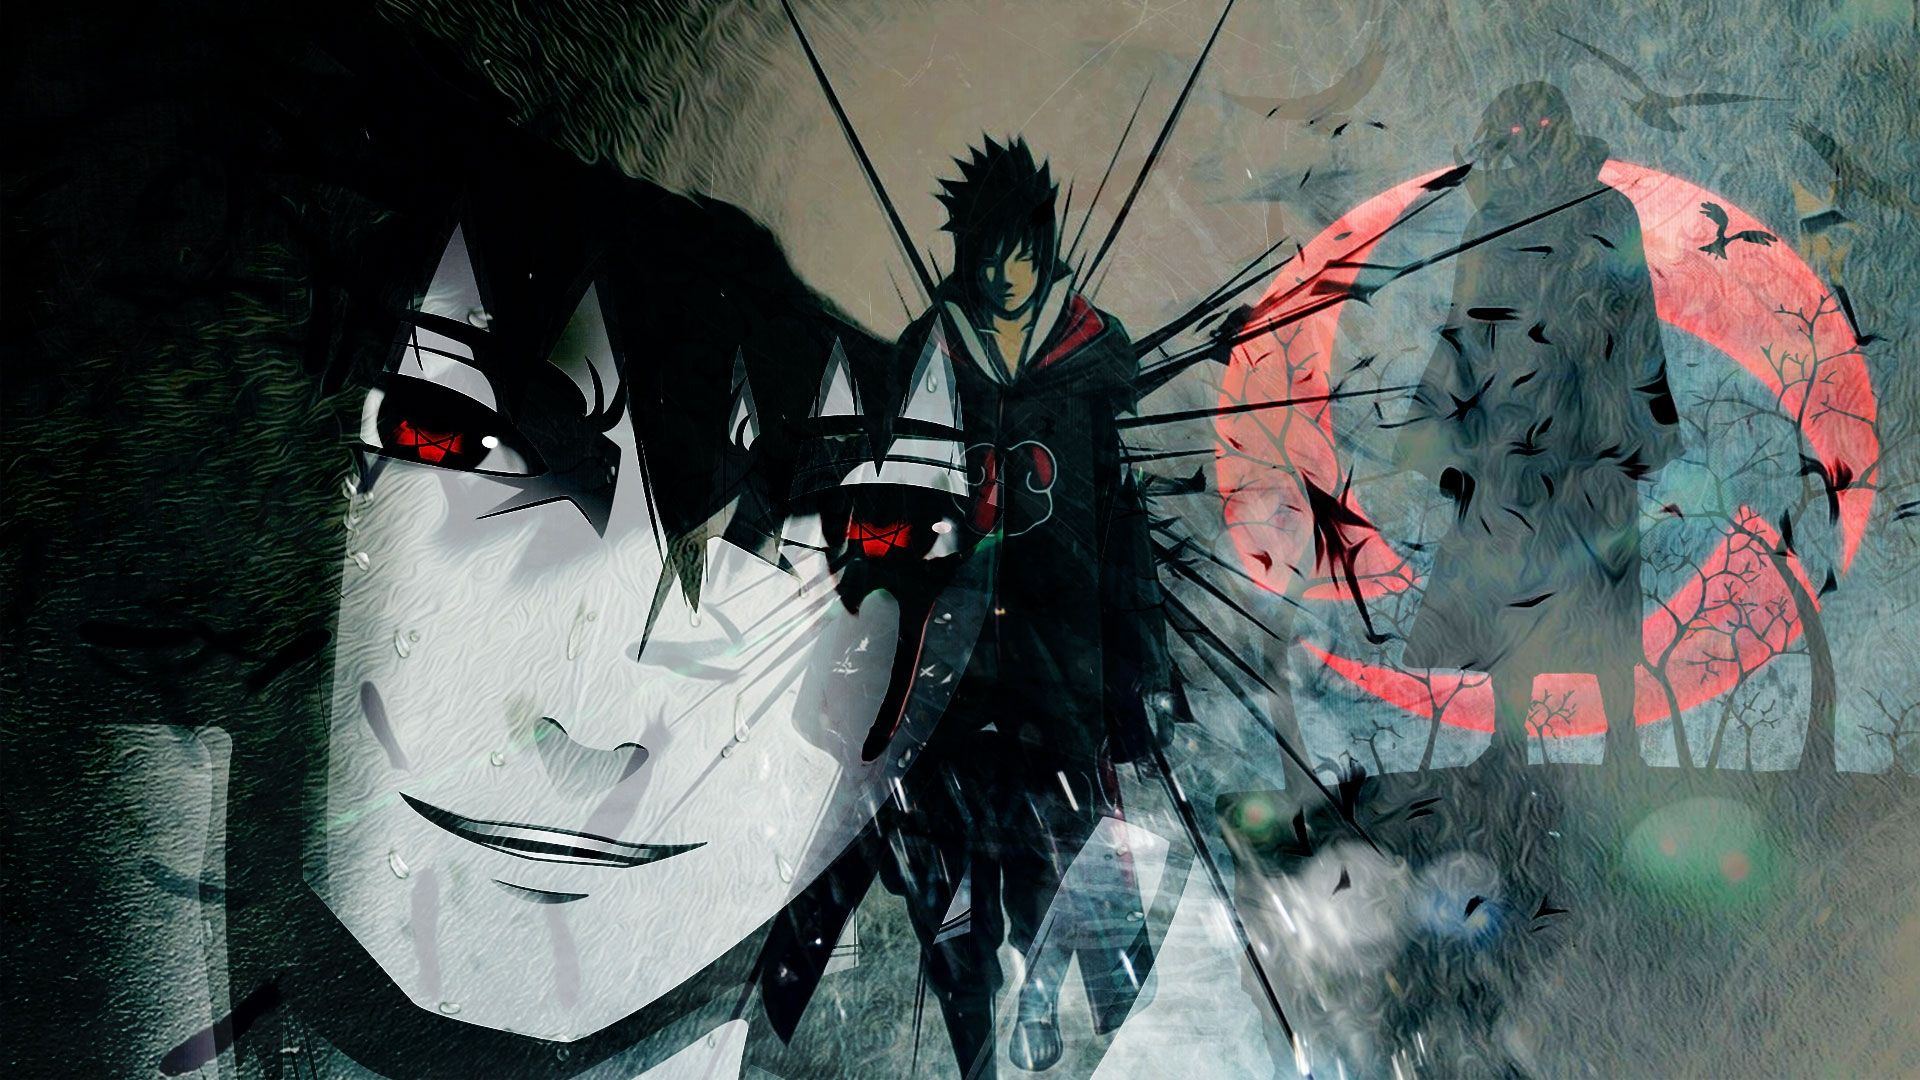 Naruto And Sasuke art, Background Wallpaper HD